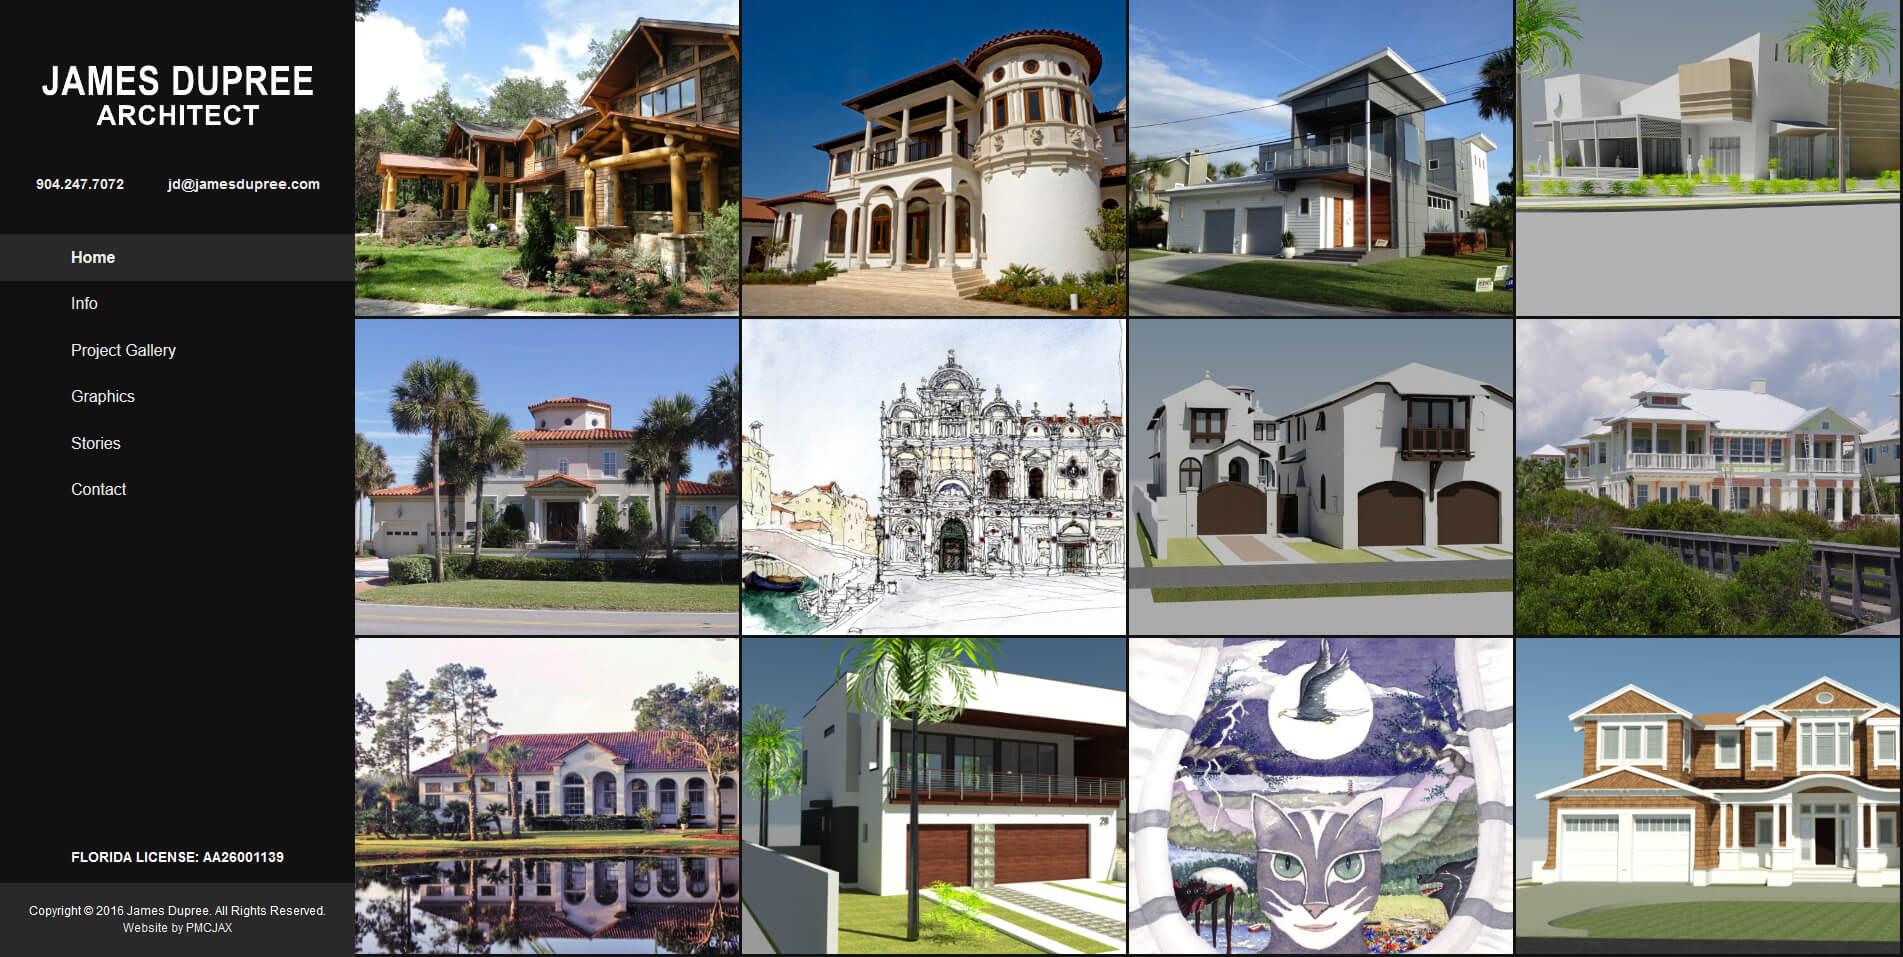 Architect Company Architect Website Design Company  Website Design Company For